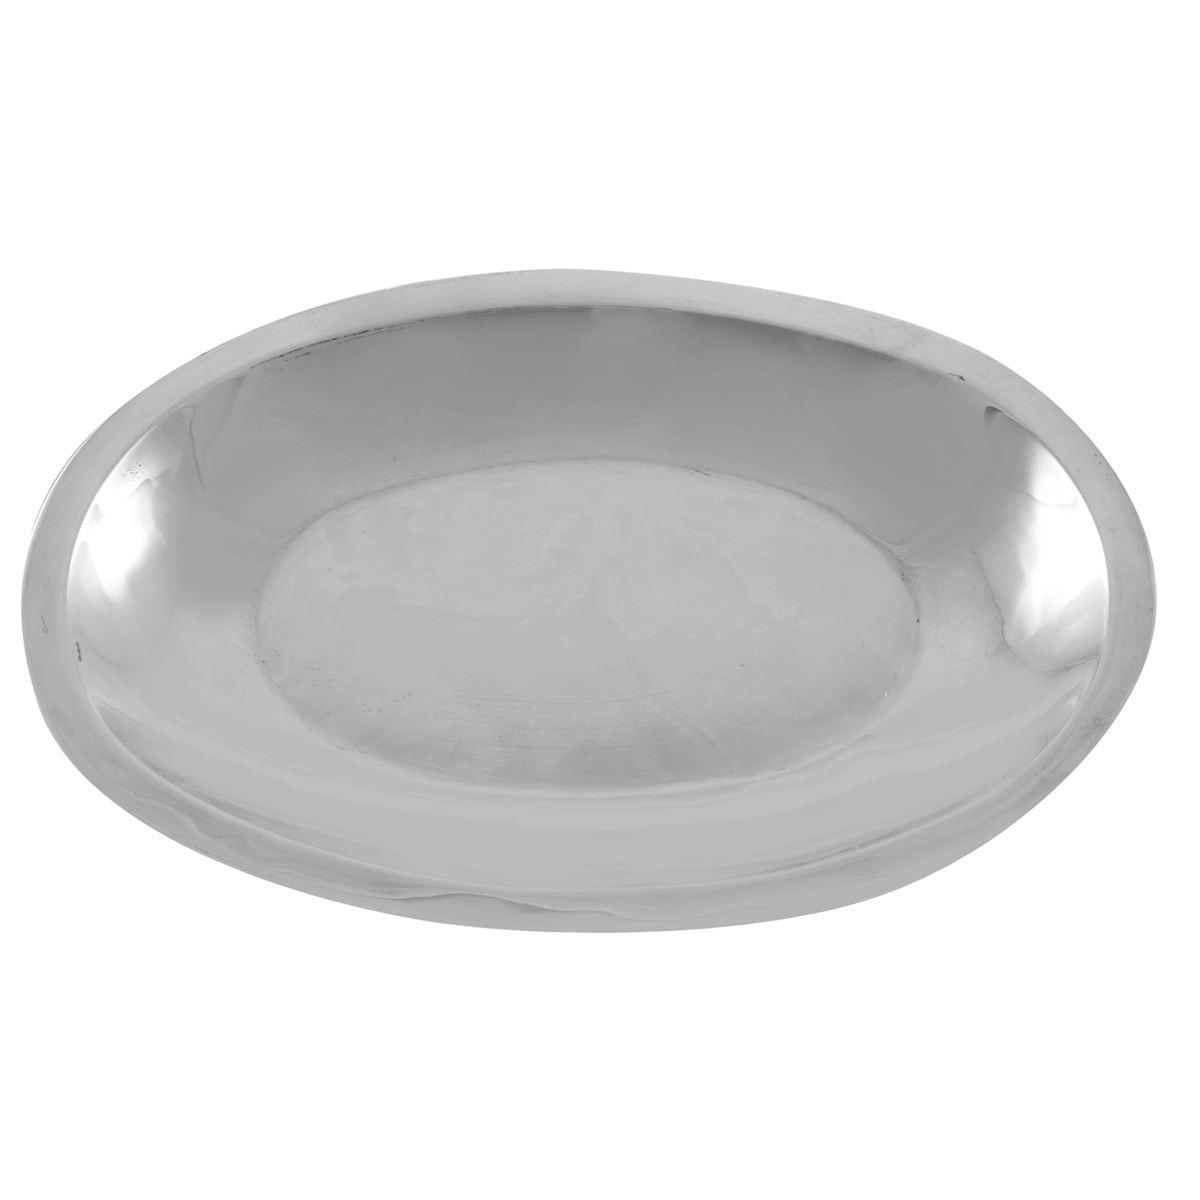 3005 panera lisa oval 455grs  - Sanborns